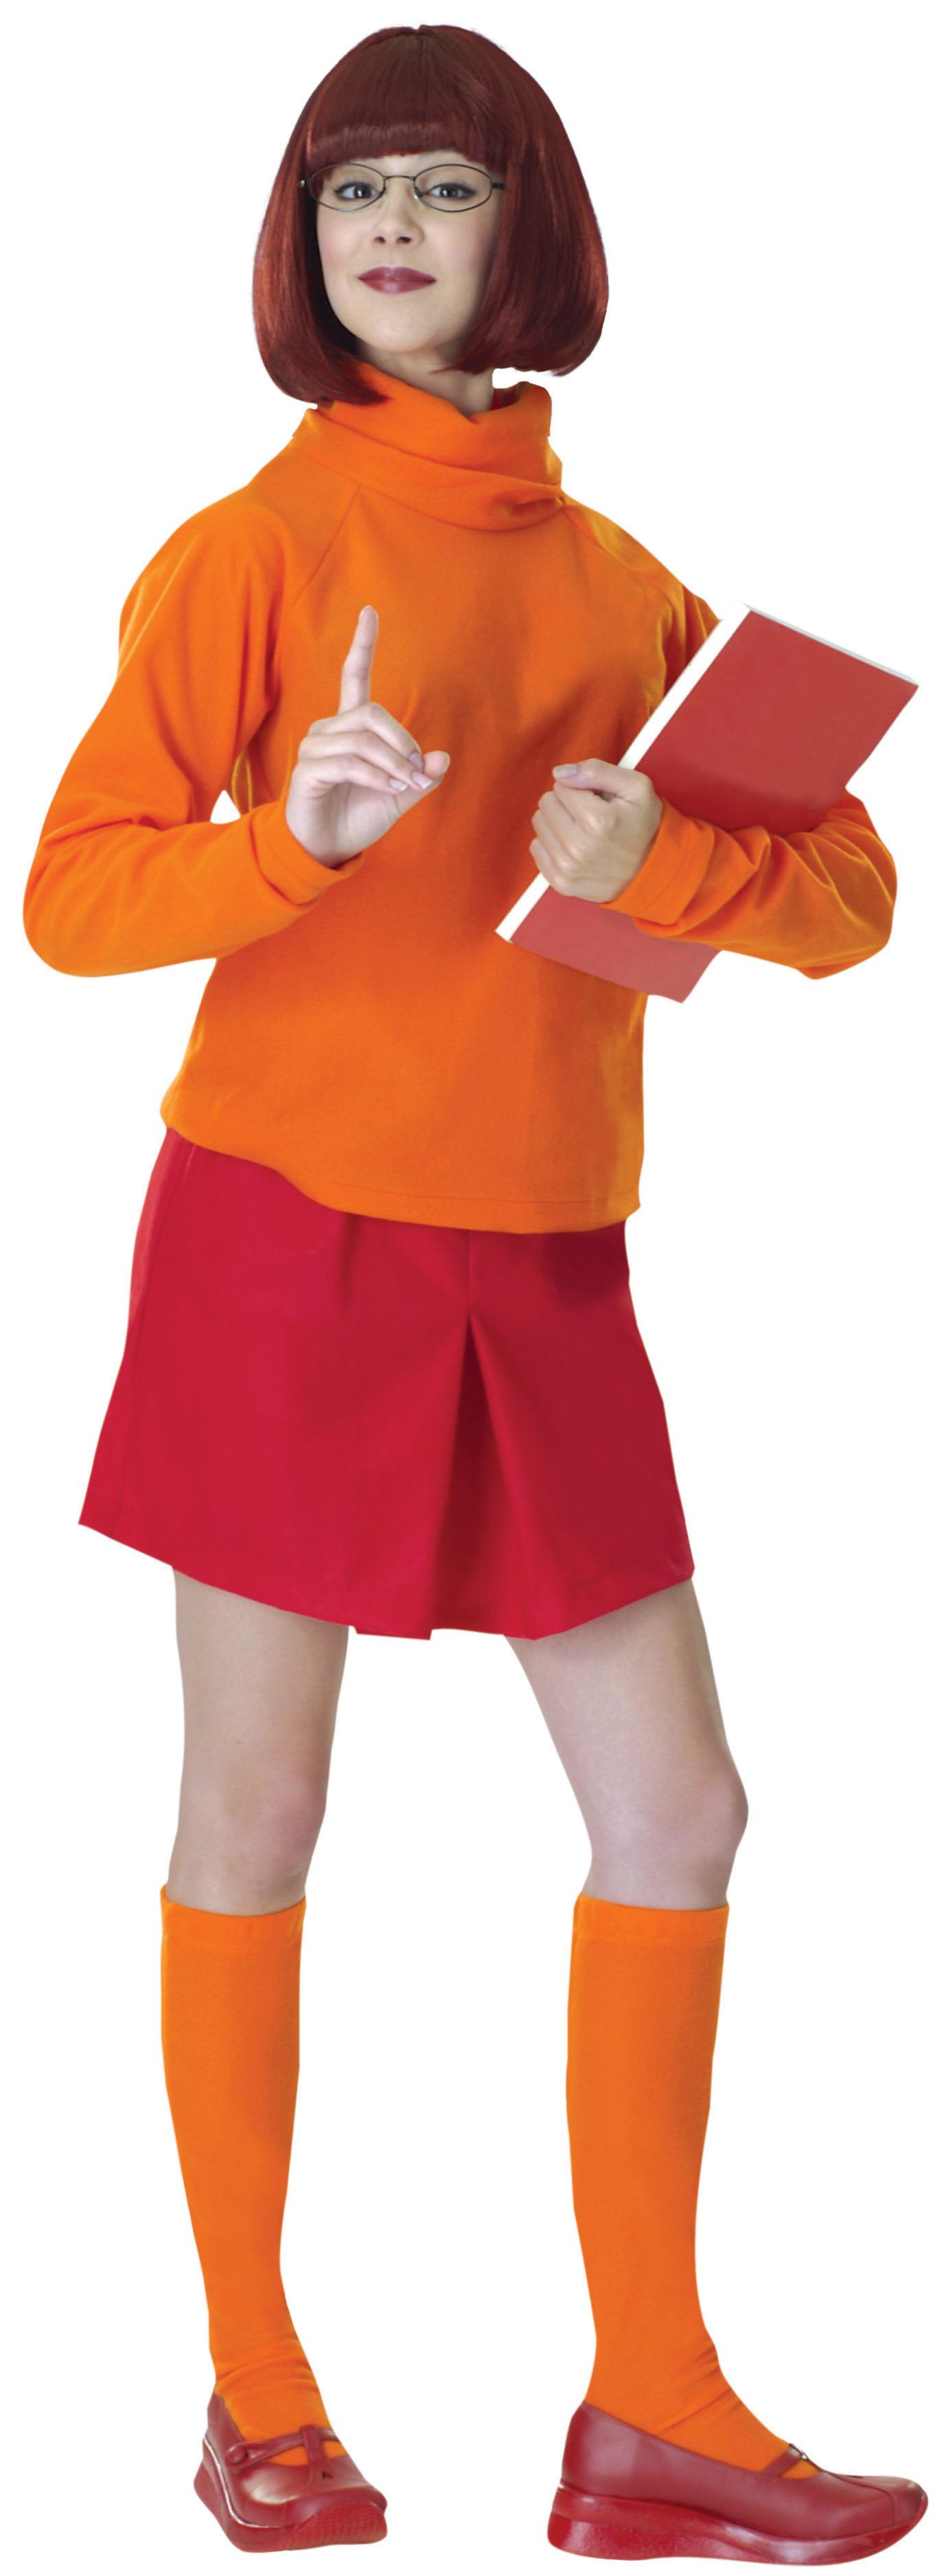 Scooby Doo Velma 2